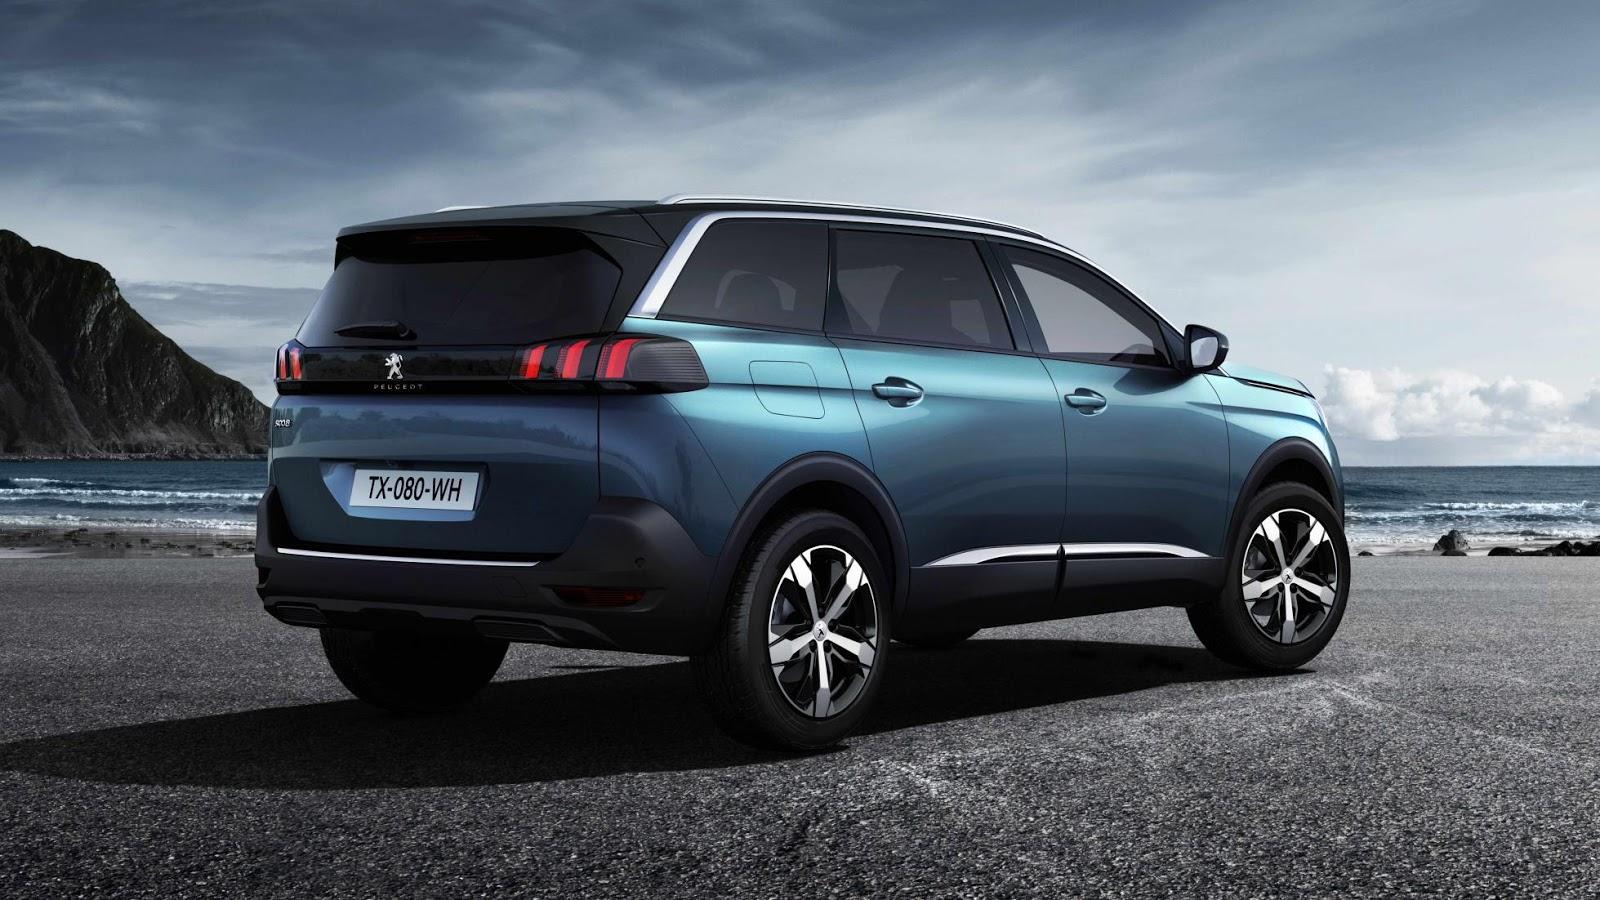 peugeot 5008 Φουλ επίθεση από την Peugeot με τρία νέα SUV! autoshow, PARIS MOTOR SHOW, Peugeot, SUV, videos